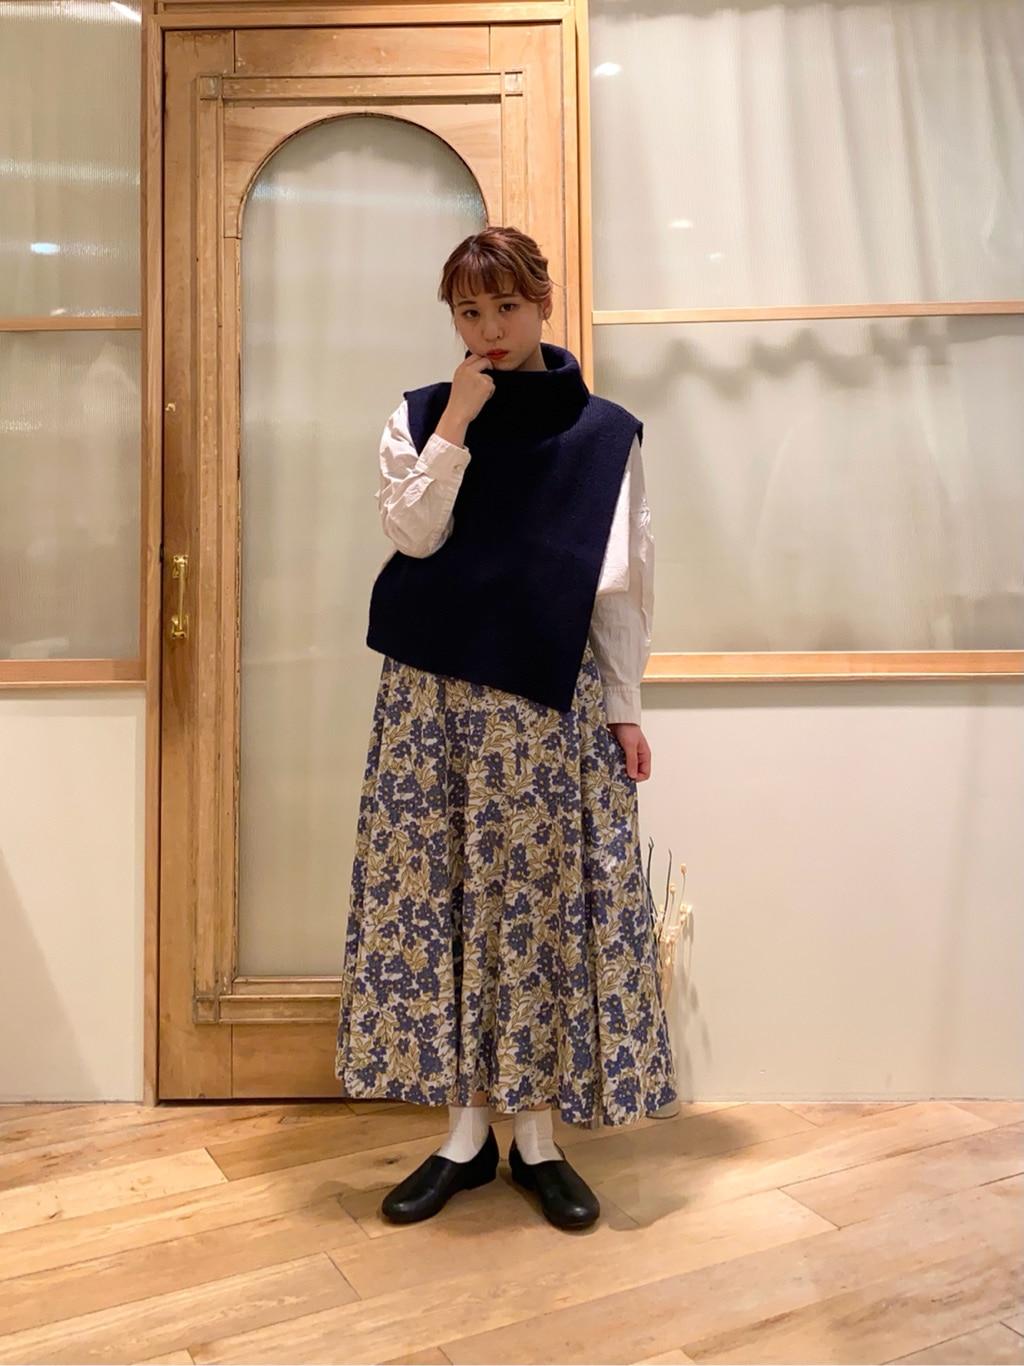 bulle de savon 新宿ミロード 身長:157cm 2020.12.16